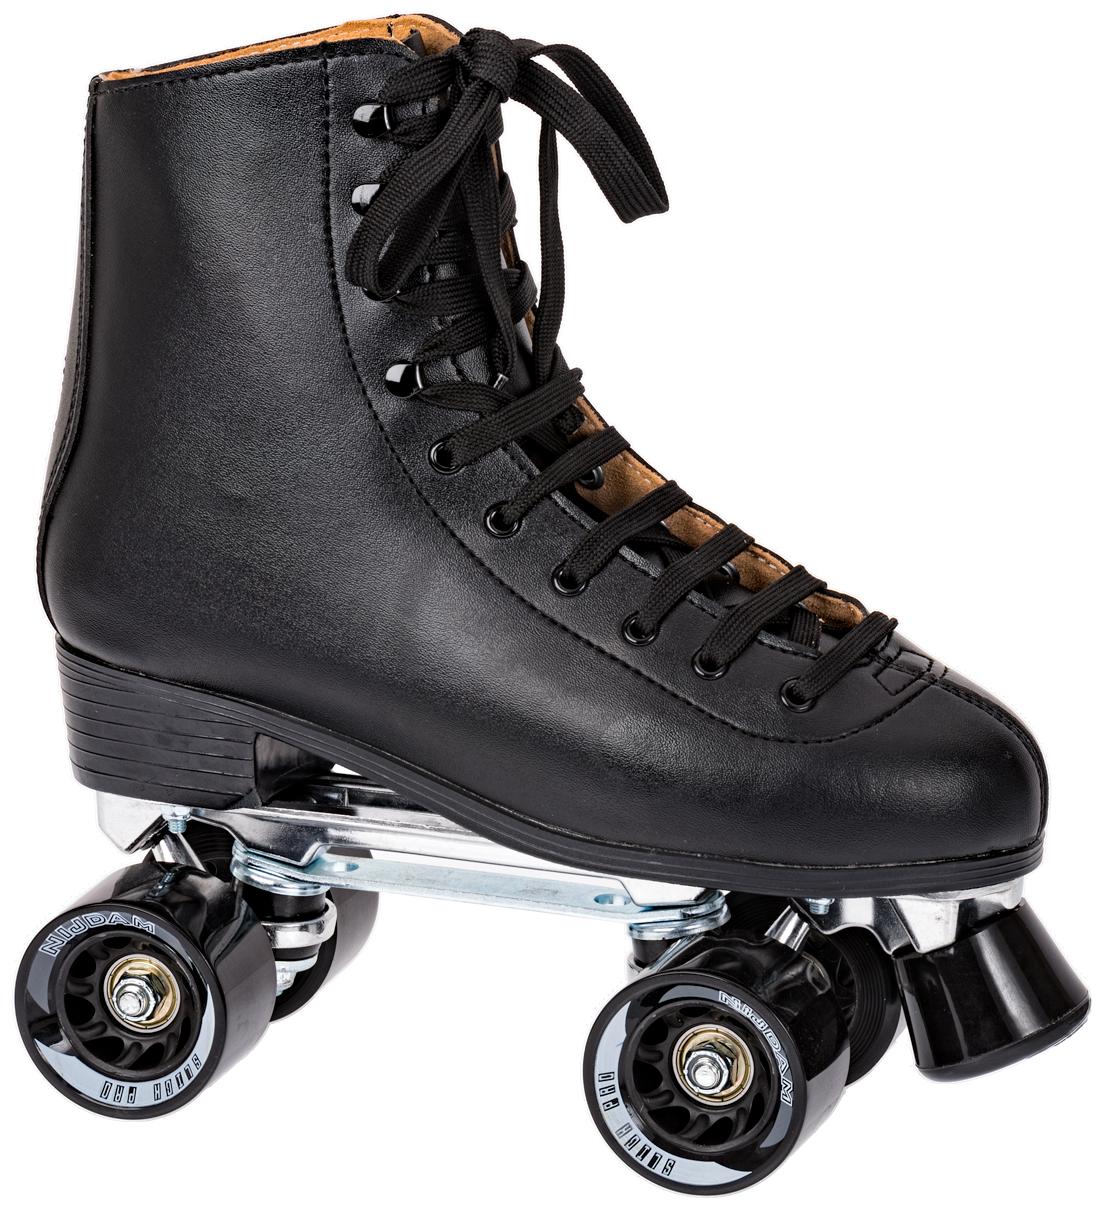 bc8d7caae1e Nijdam Rollerquad classic black leather bestellen bij Skate-dump.com